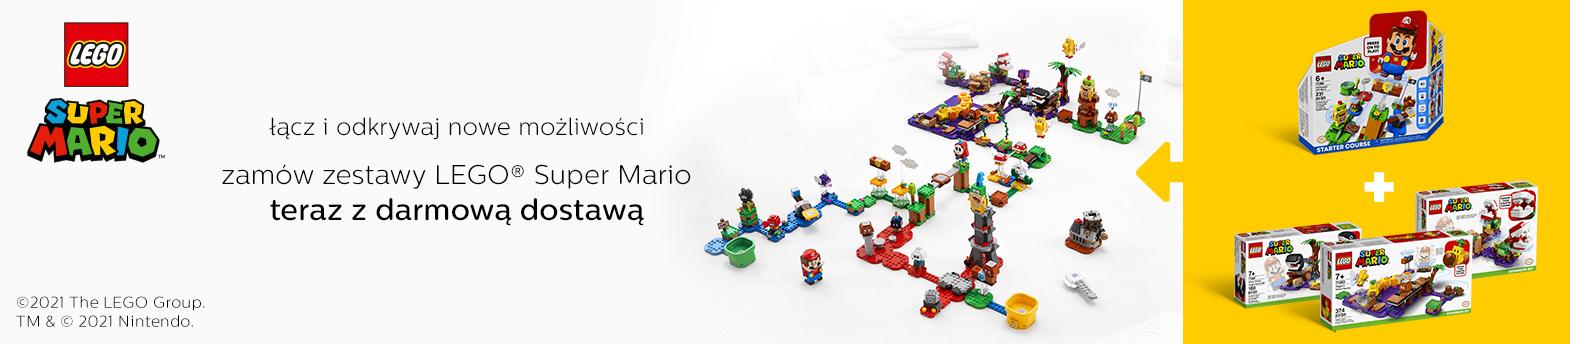 LEGO® Super Mario - darmowa dostawa